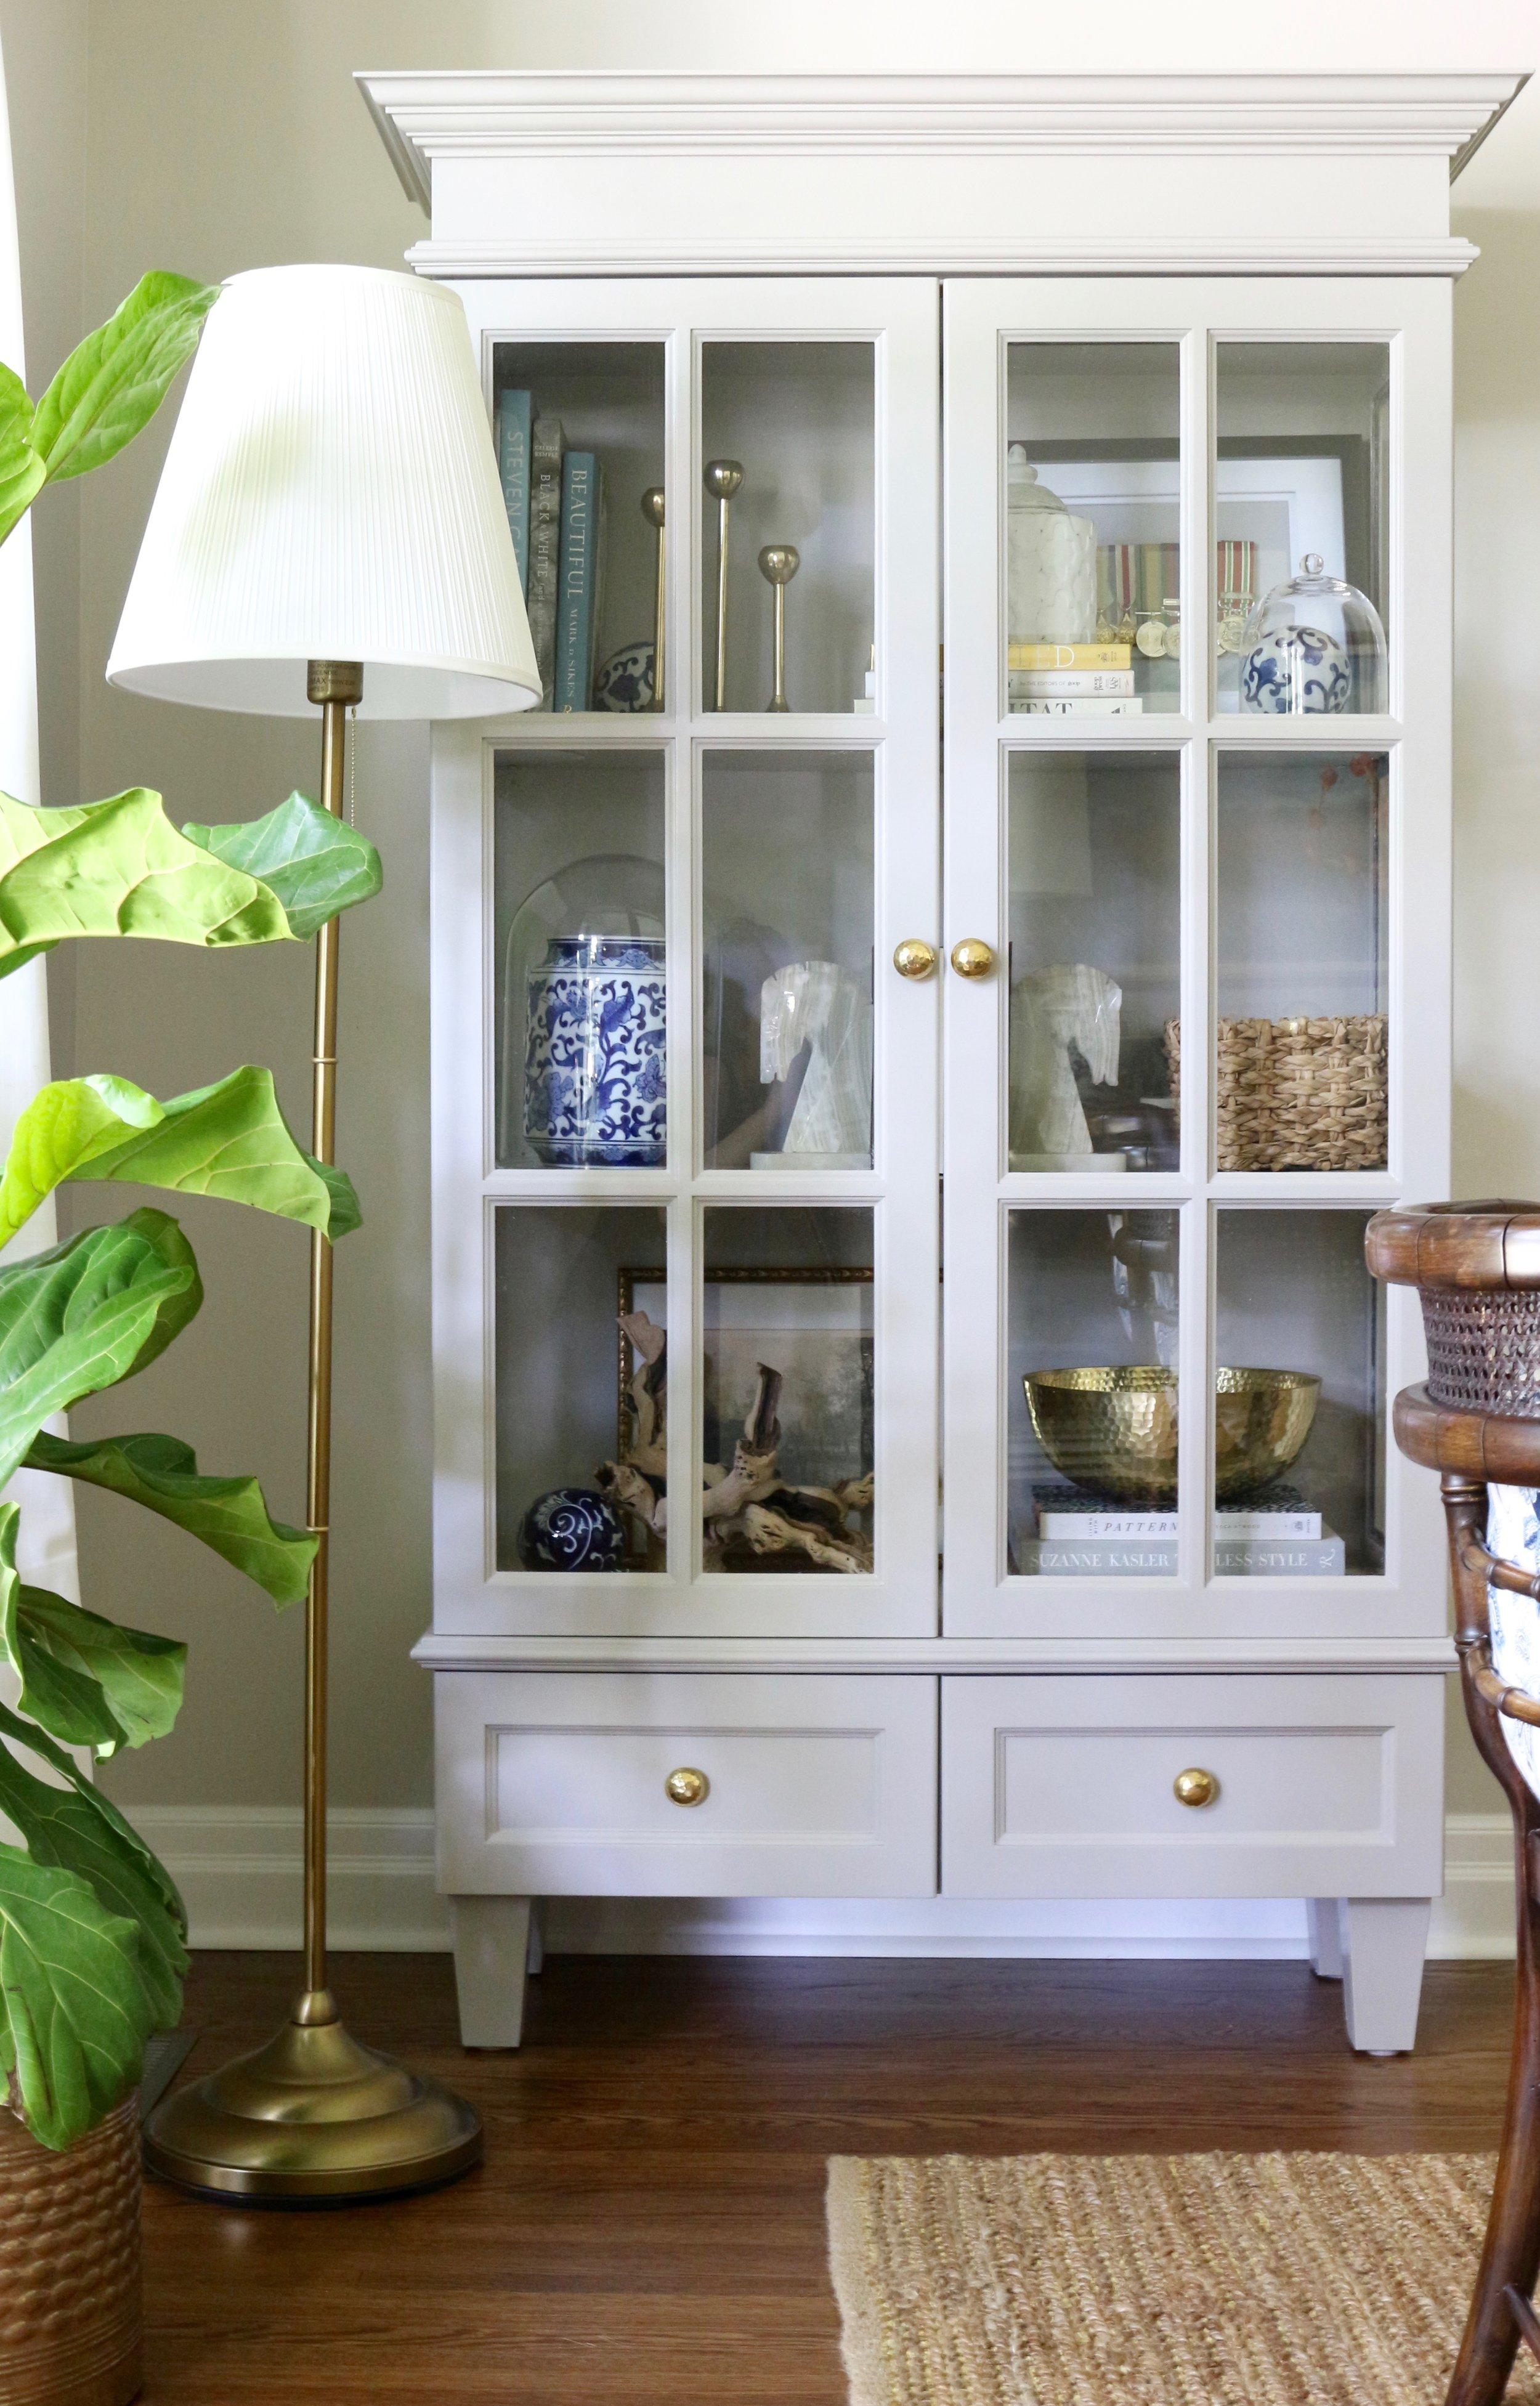 Crate-and-Barrel-inspired-DIY-cabinet.jpg